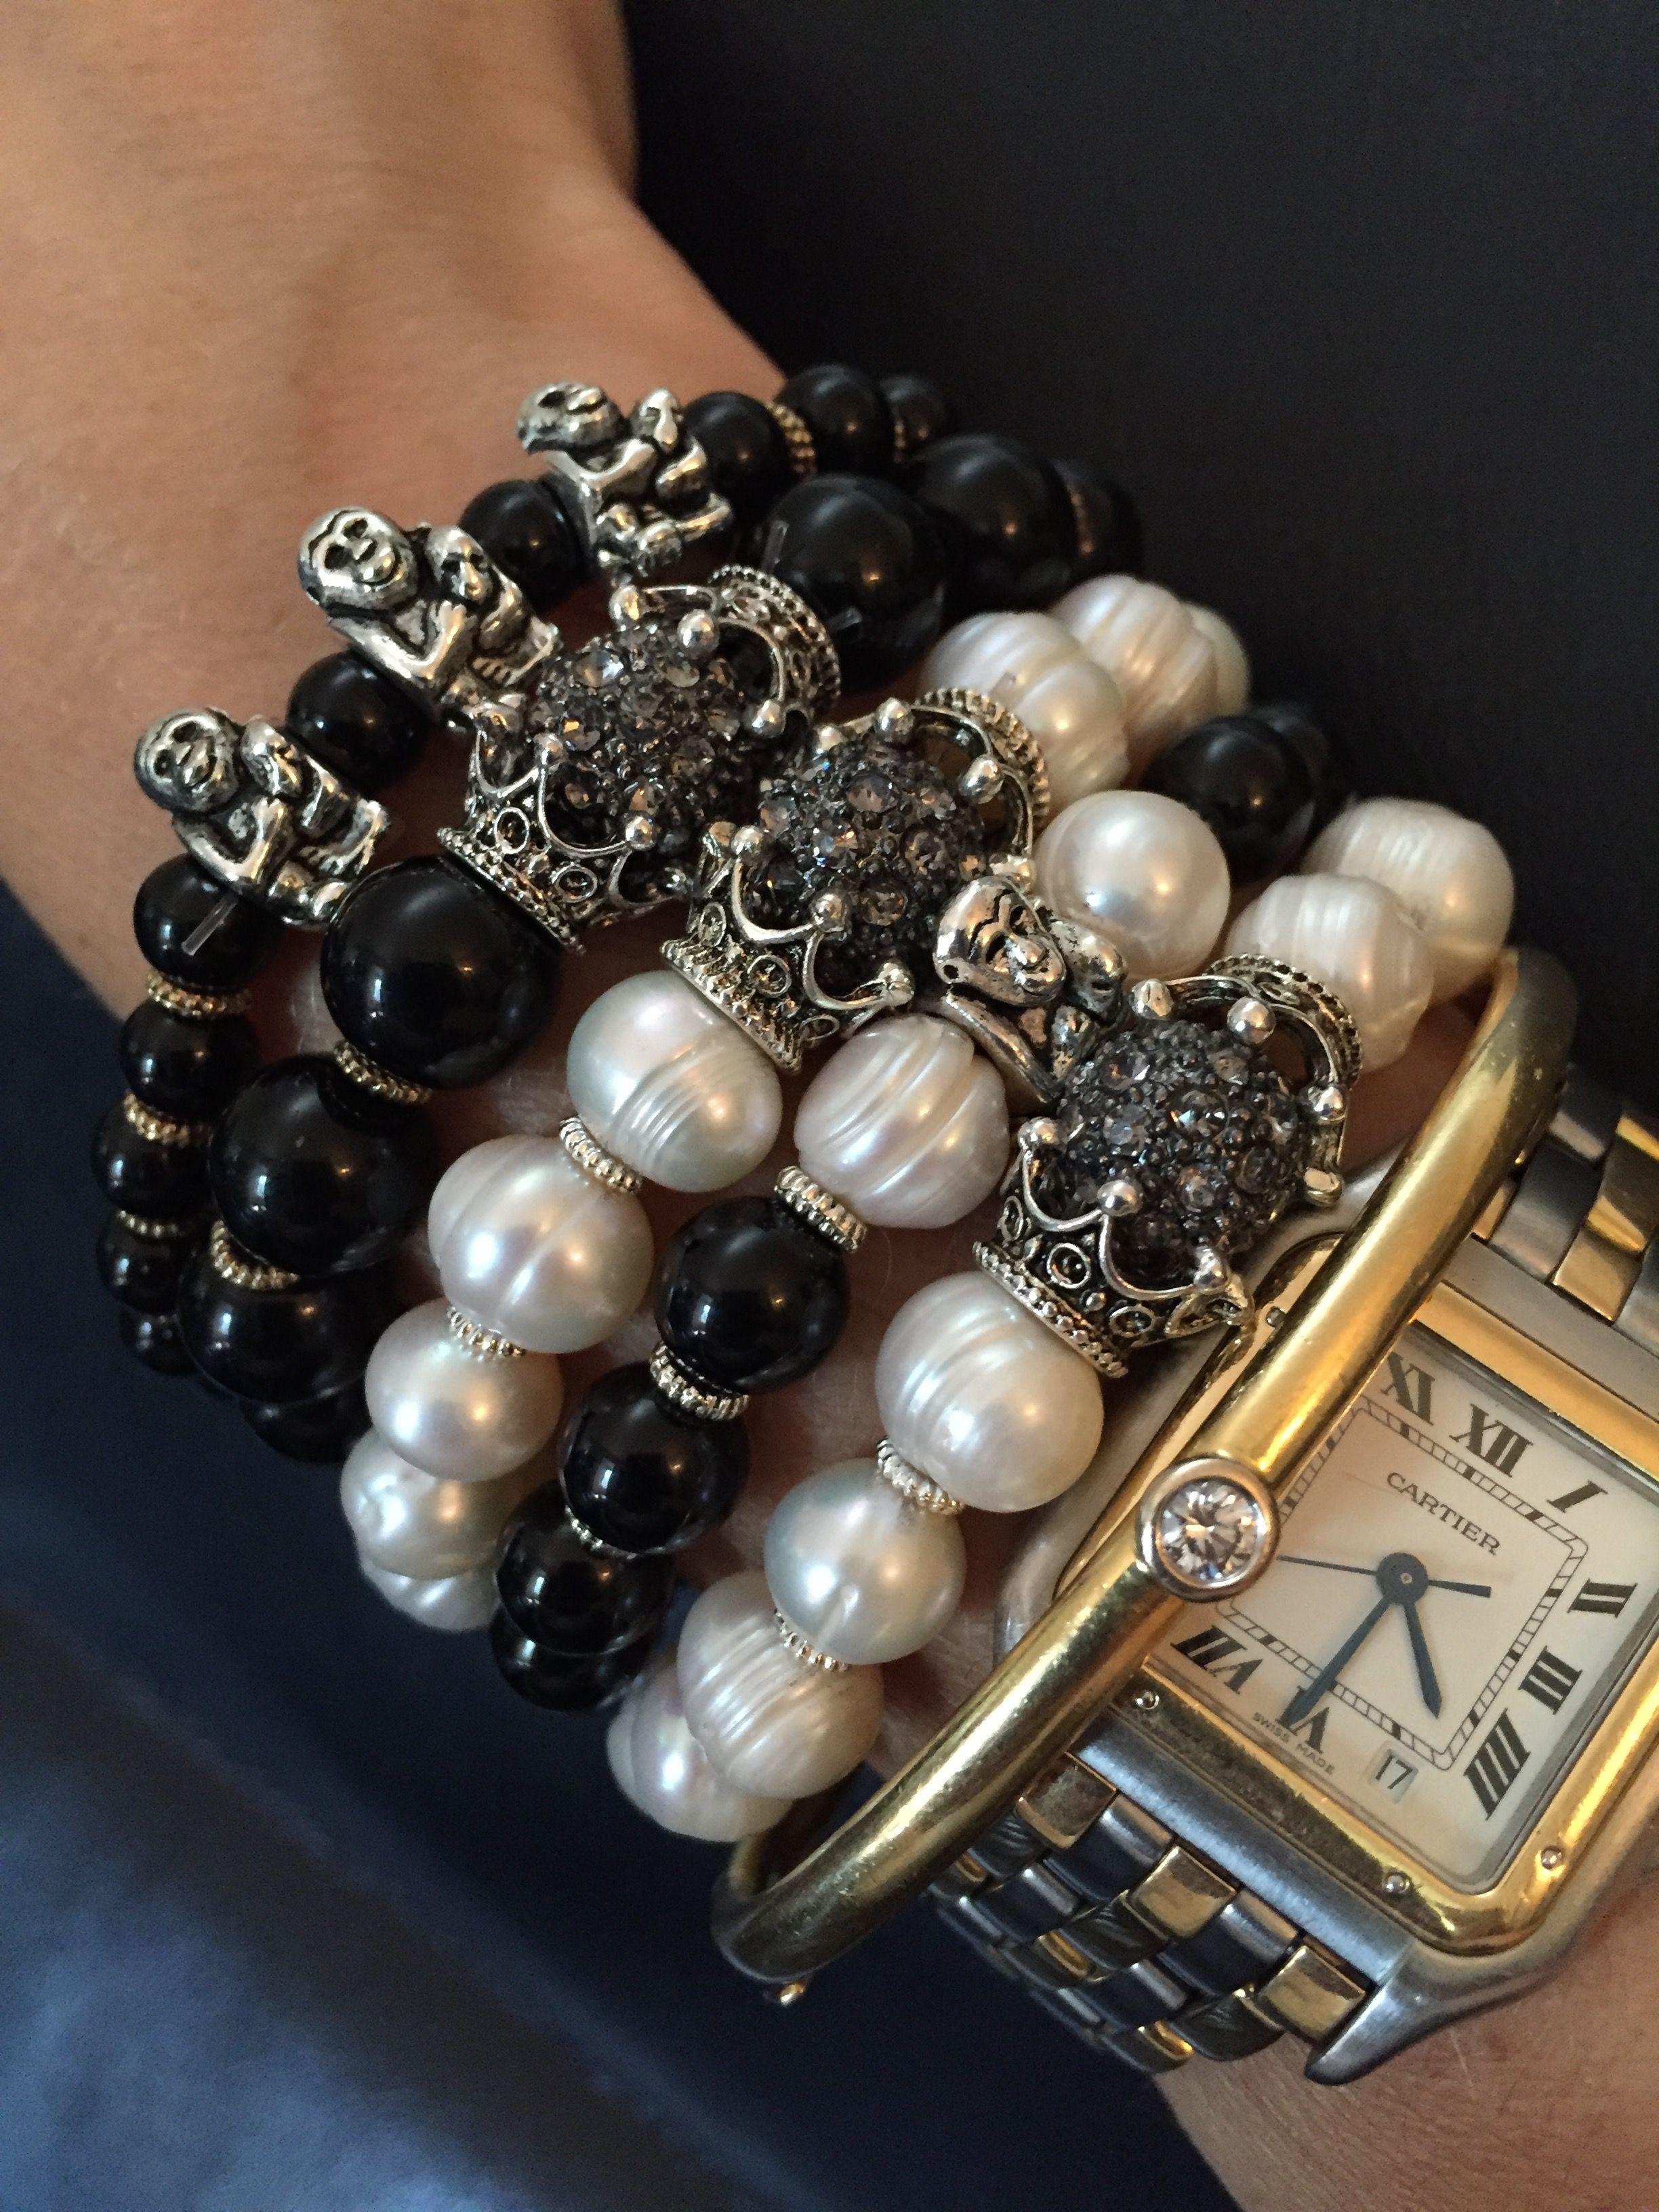 Pin By Venera Seifelmlioukova On By Me Jewelry Making Handmade